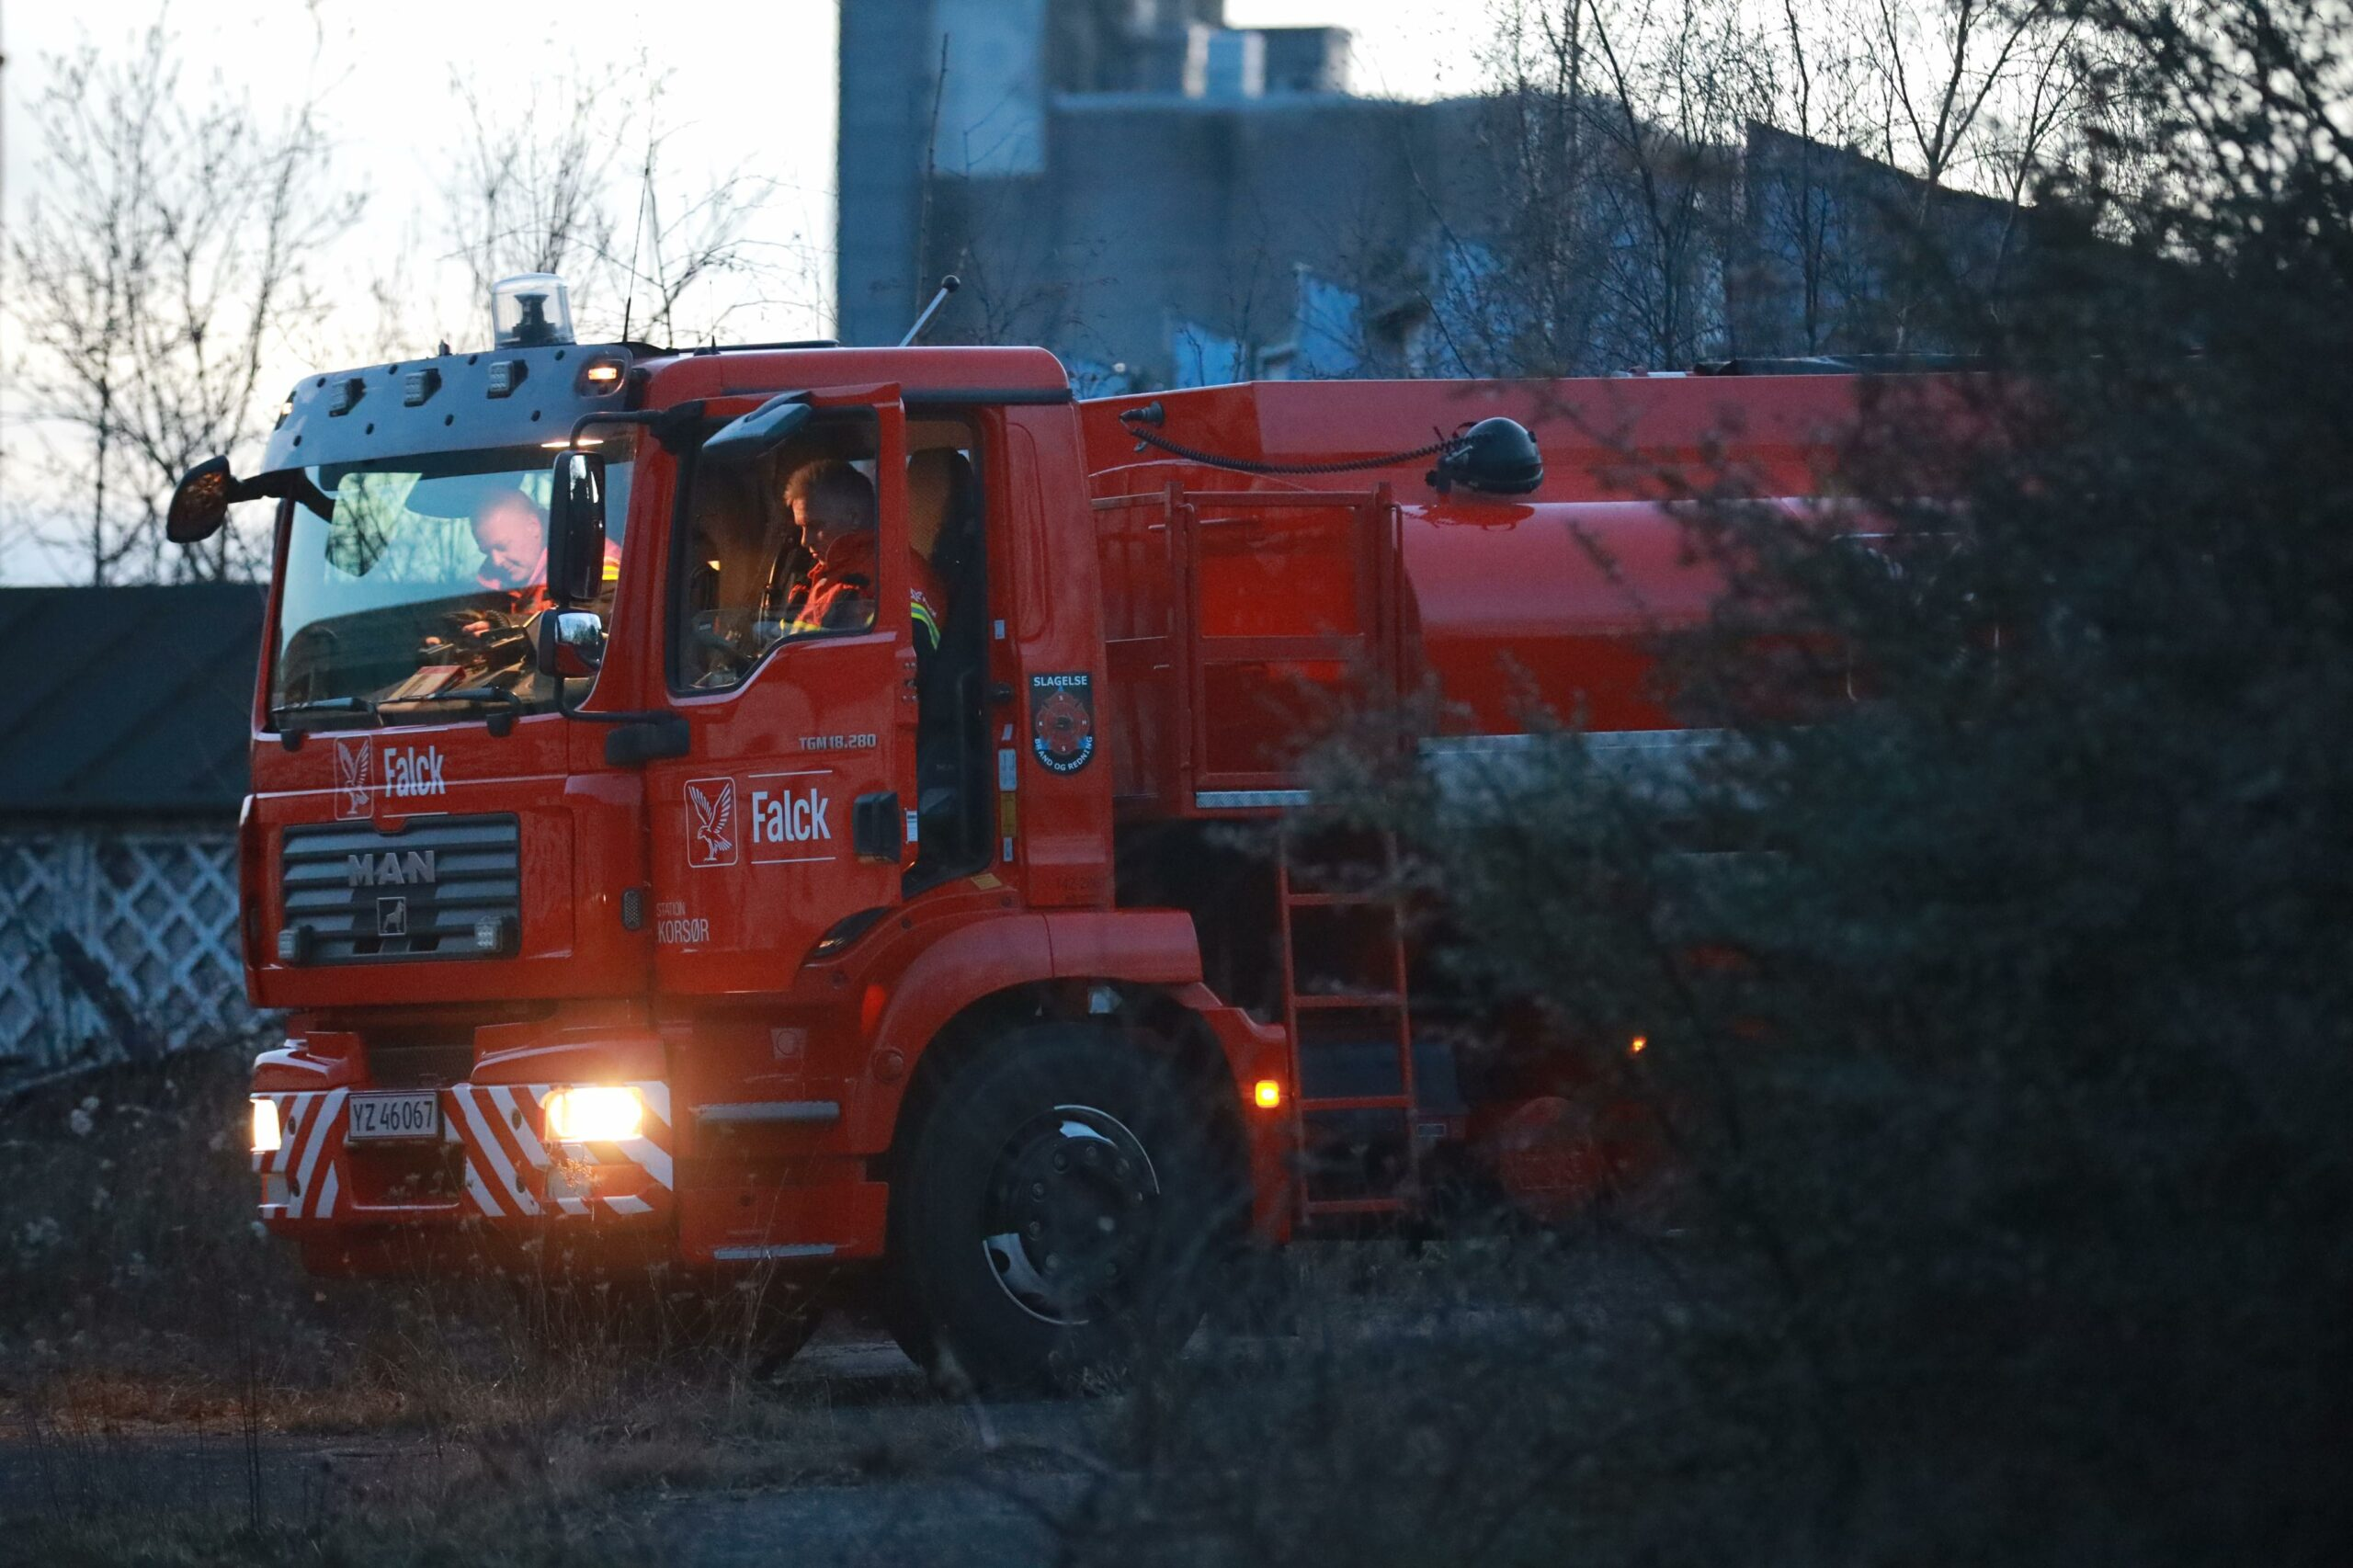 Brand i forladt bygning i Korsør